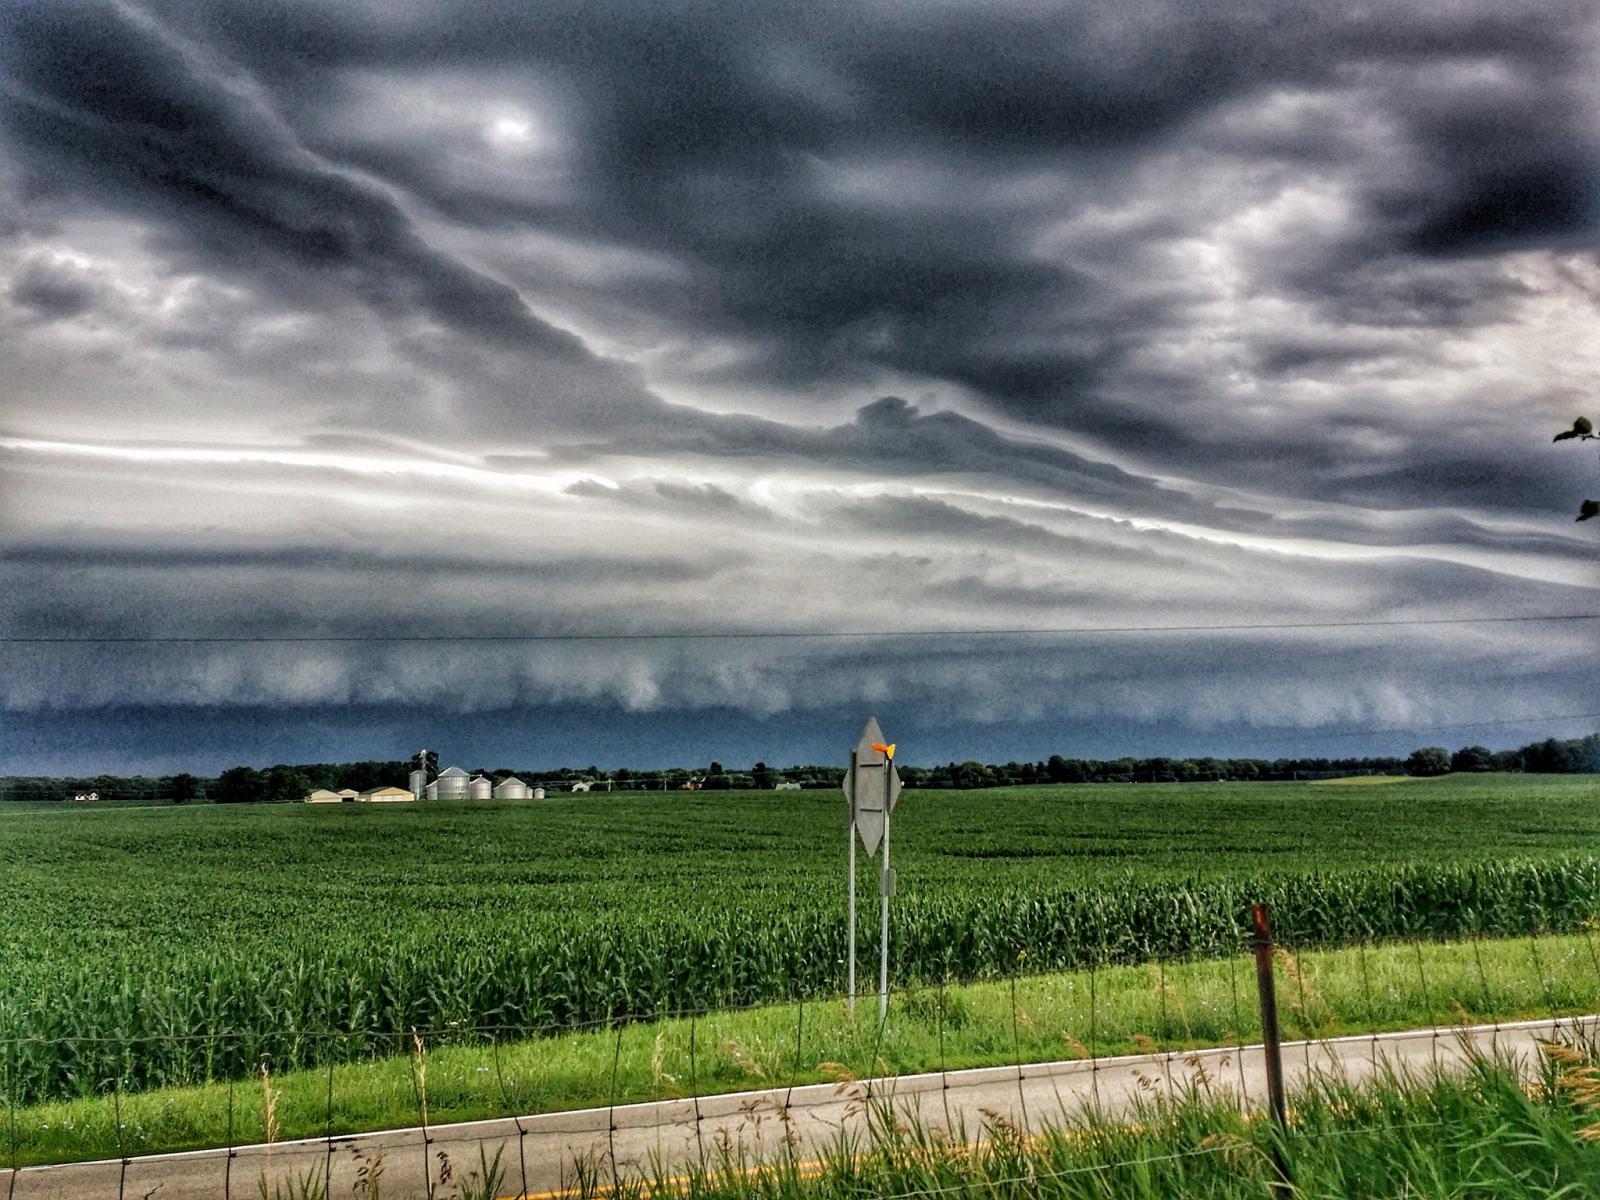 Shelf cloud photo in Campton Hills - Photo by Tim Felinski